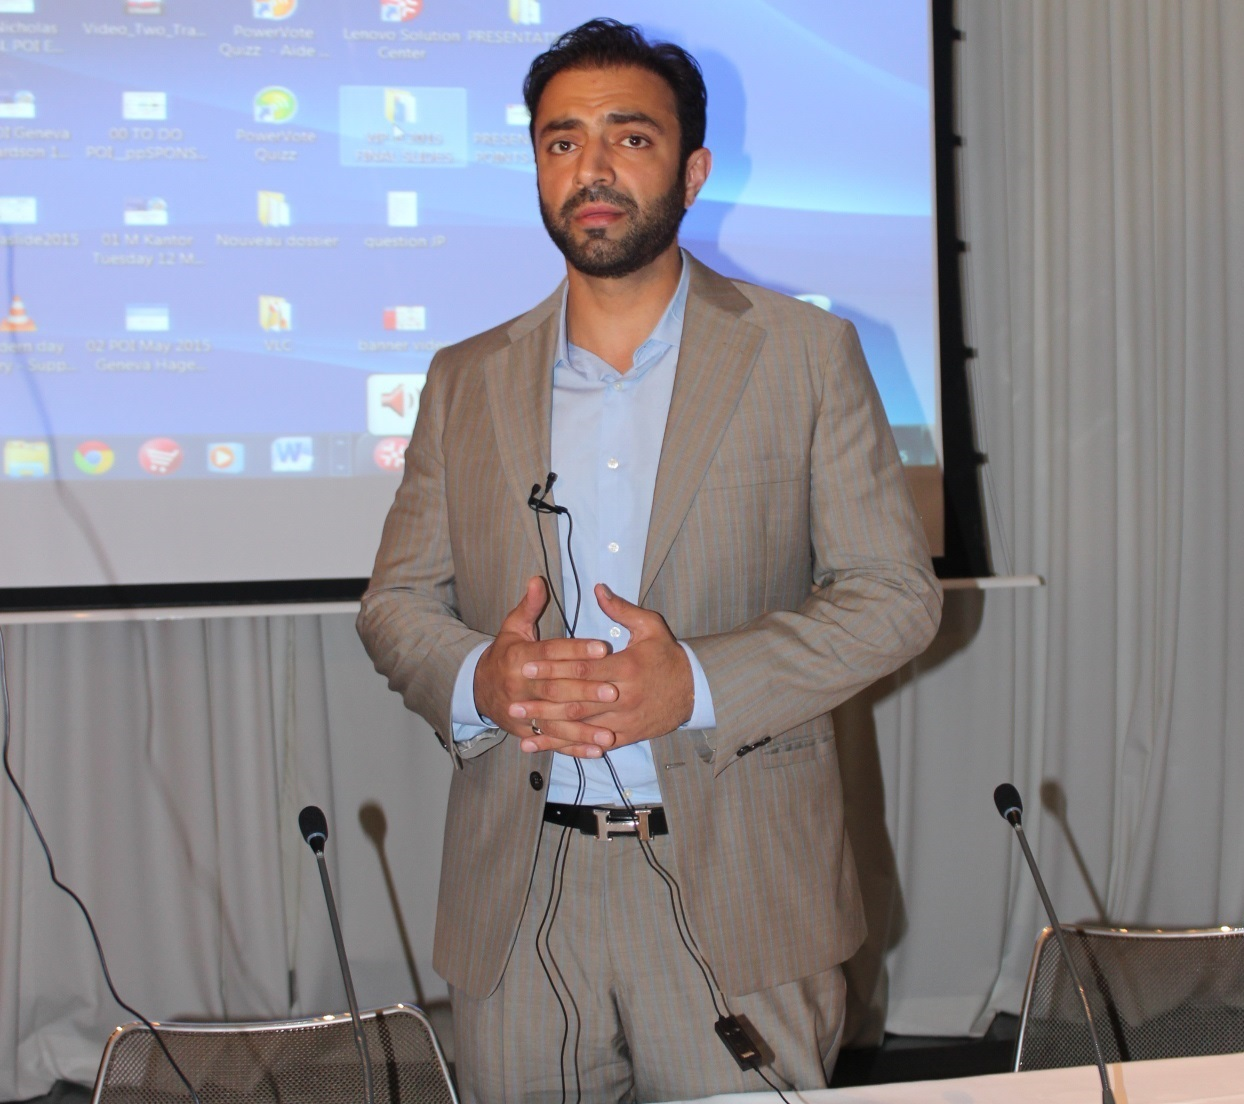 baloch leader seeks india - HD1244×1104